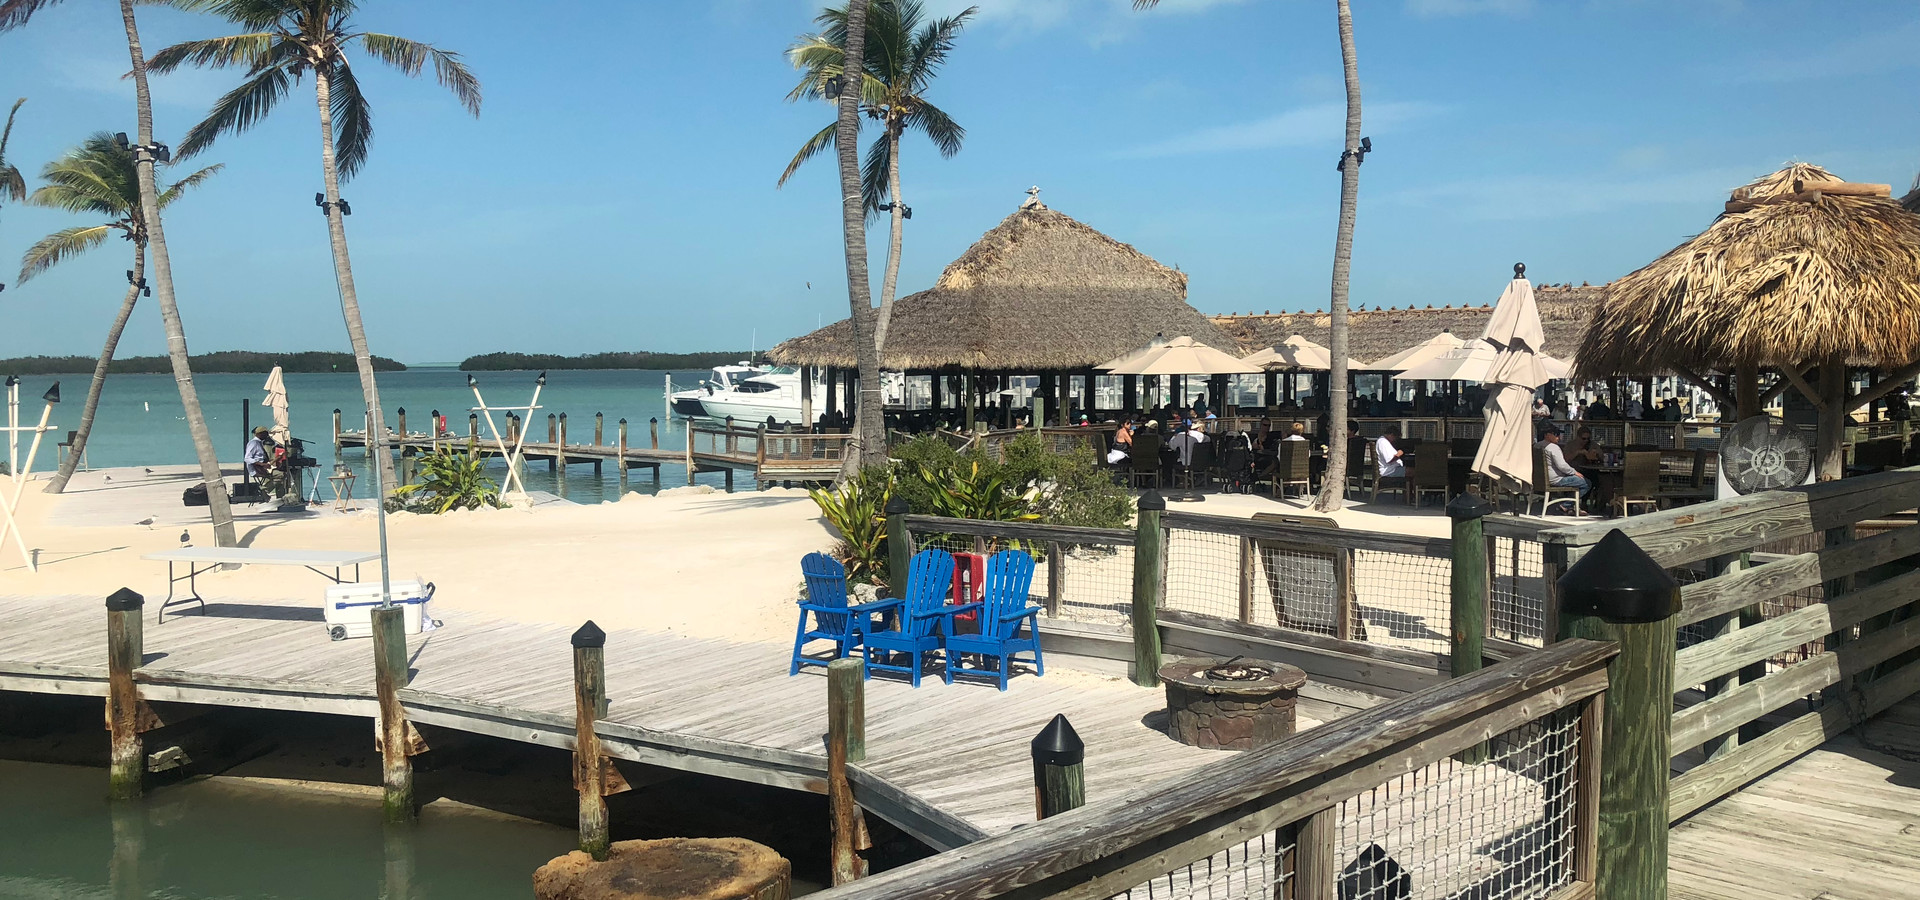 Bass Pro Docks | Islamorada, FL